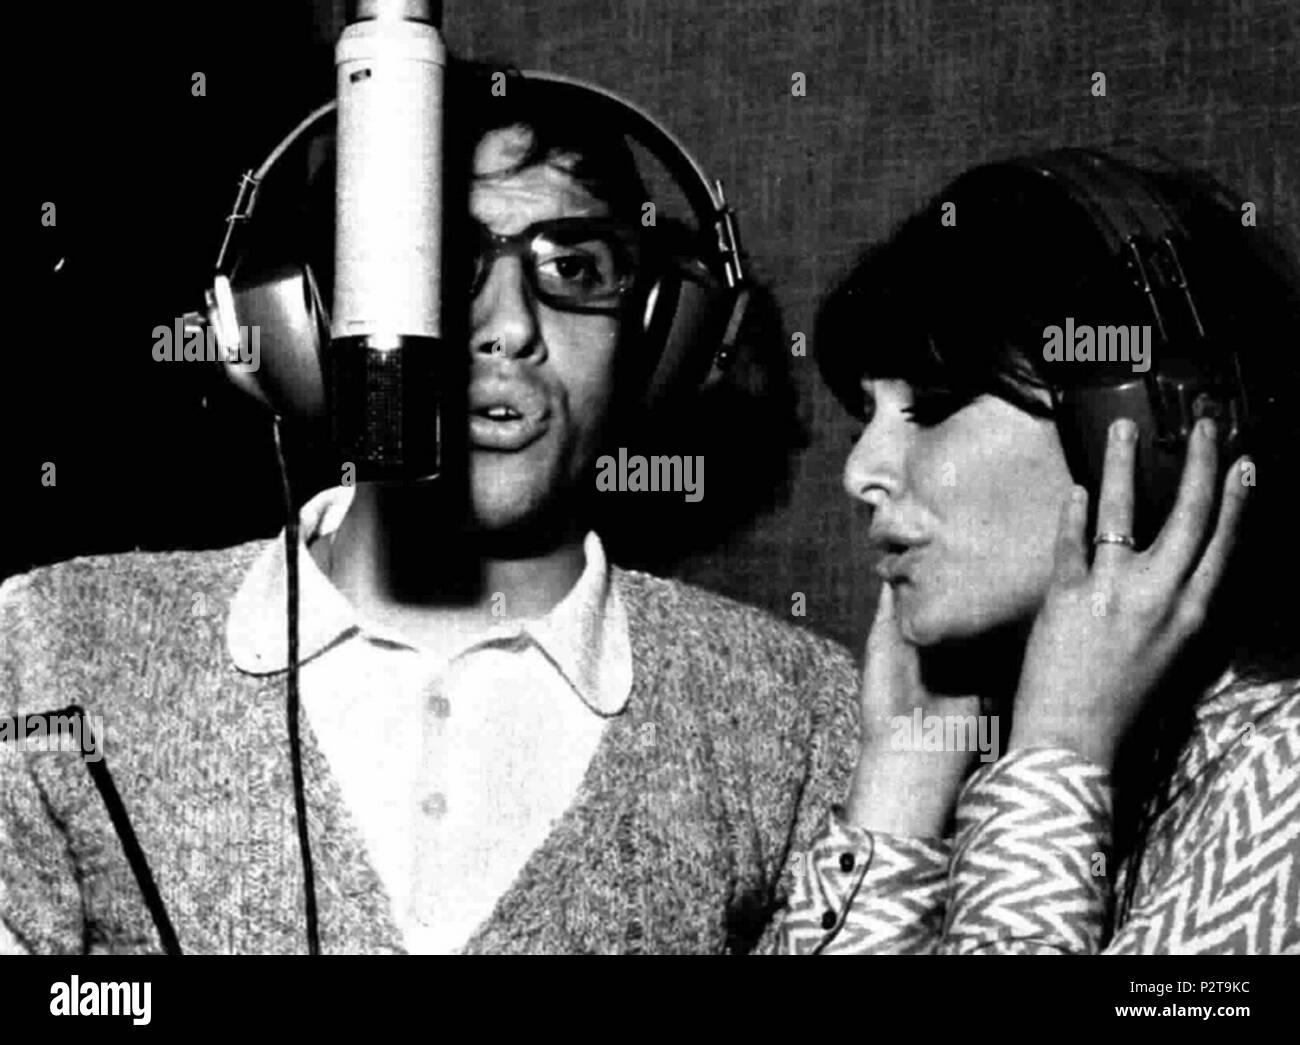 . Italian singers Adriano Celentano and Claudia Mori . 22 February 1970. Unknown 4 Adriano Celentano and Claudia Mori 1970 - Stock Image